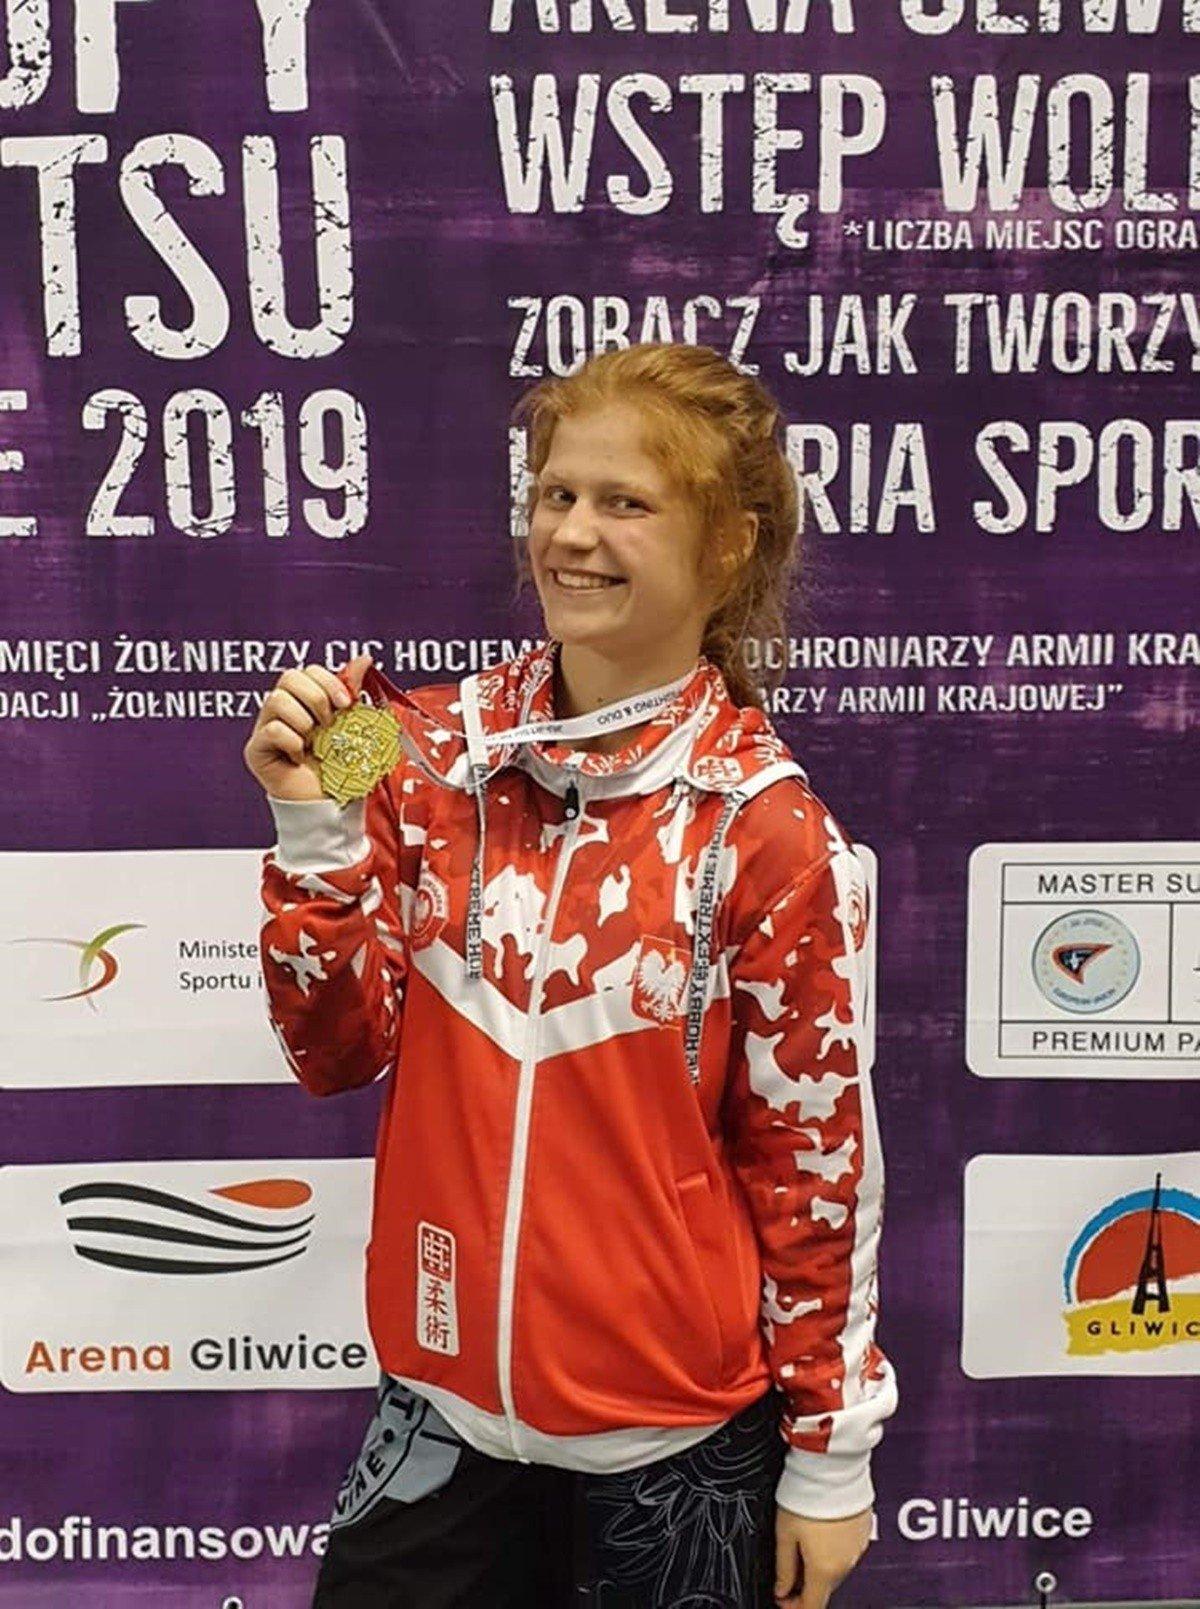 Grnik Zabrze, Piast Gliwice, Ruch Chorzw, GKS Katowice